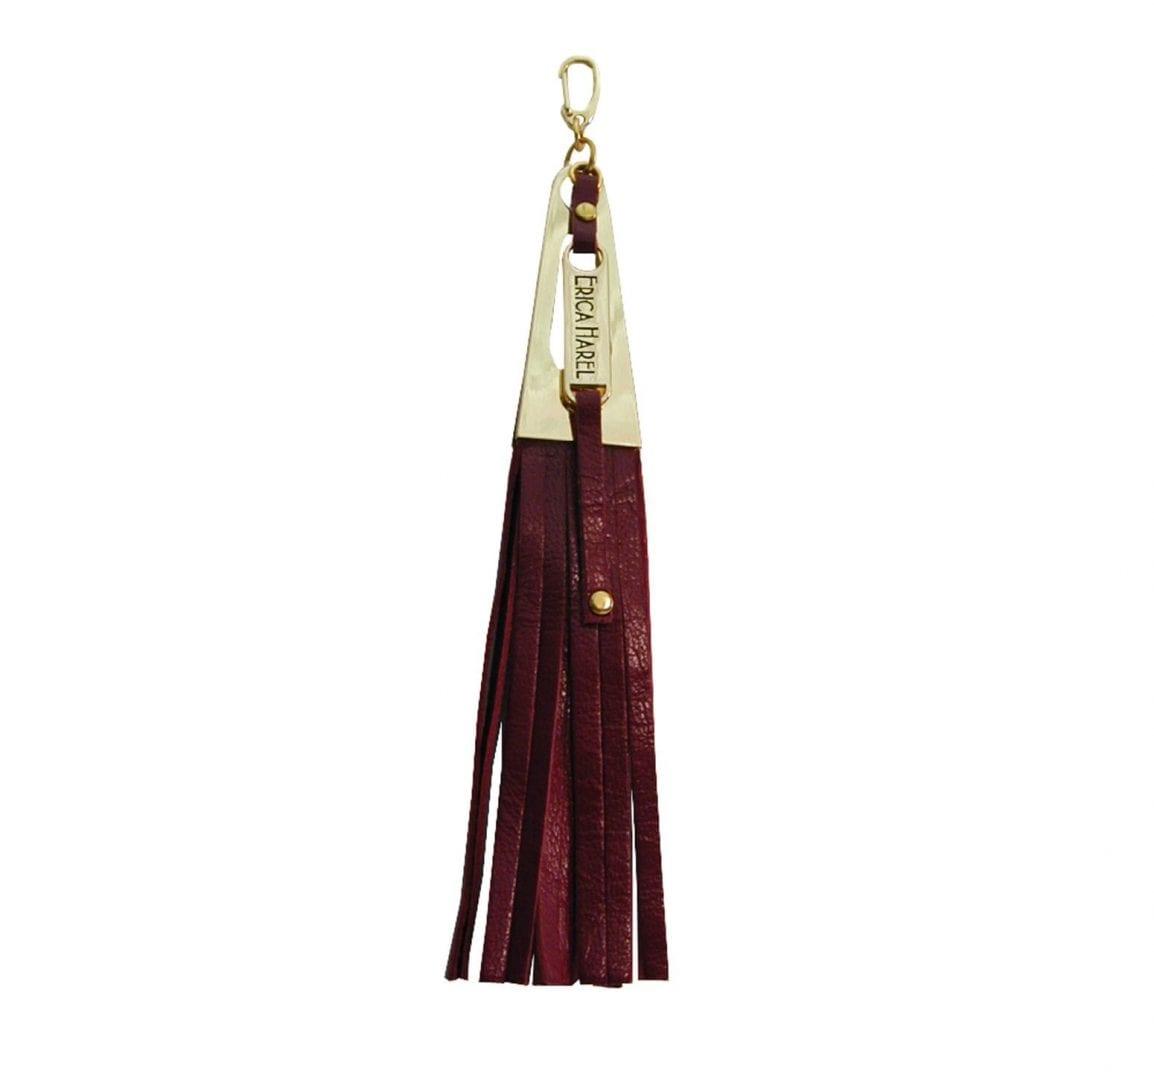 burgundy leather tassel purse charm